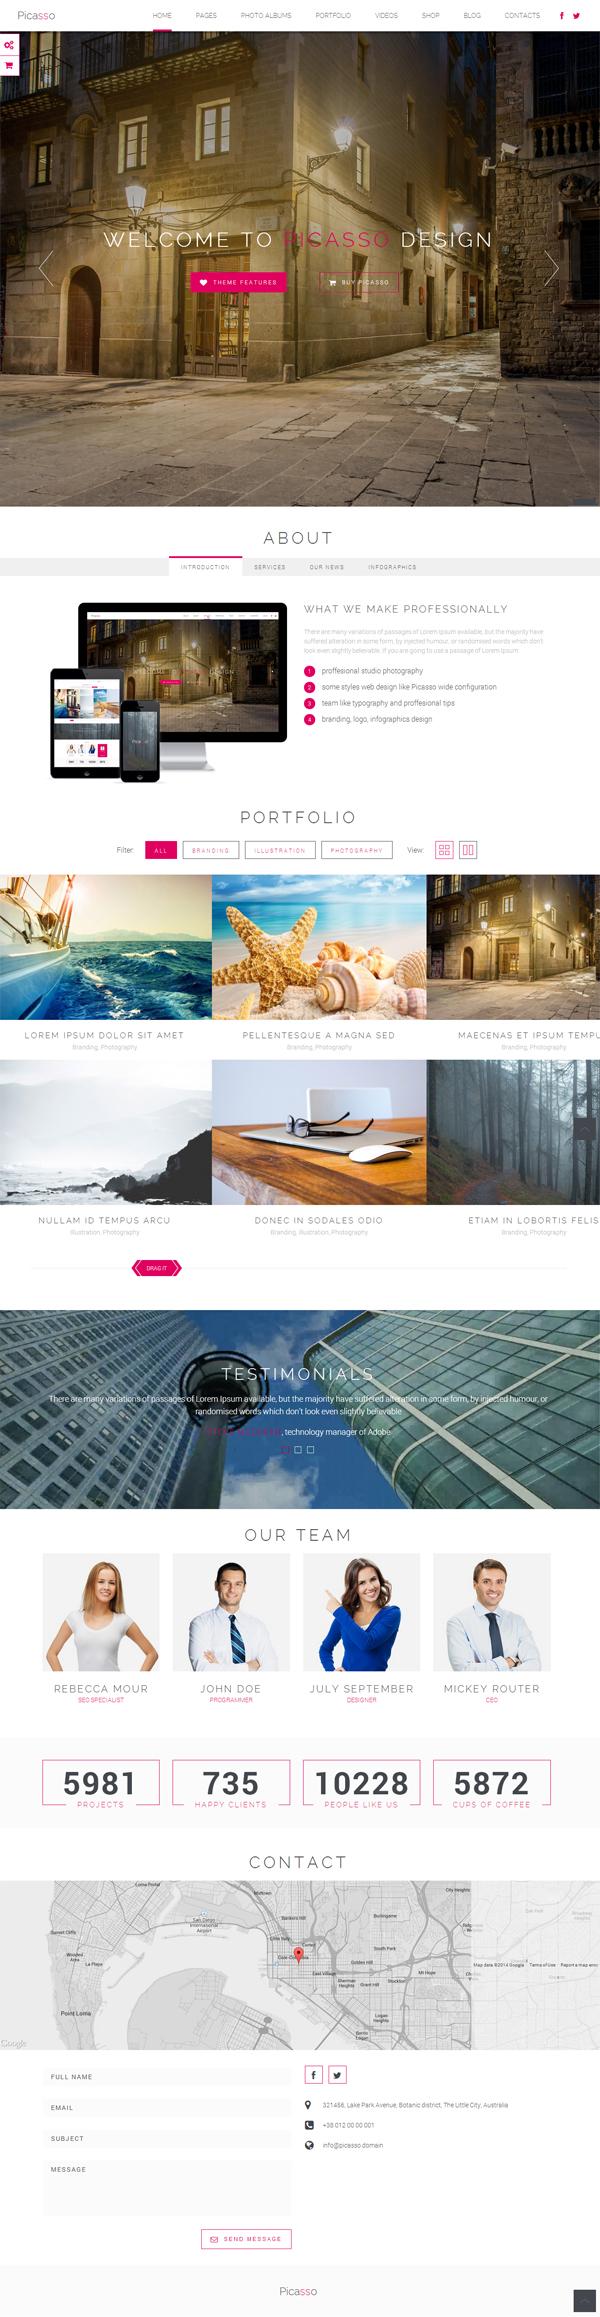 Picasso - Responsive Multi-Purpose WordPress Theme